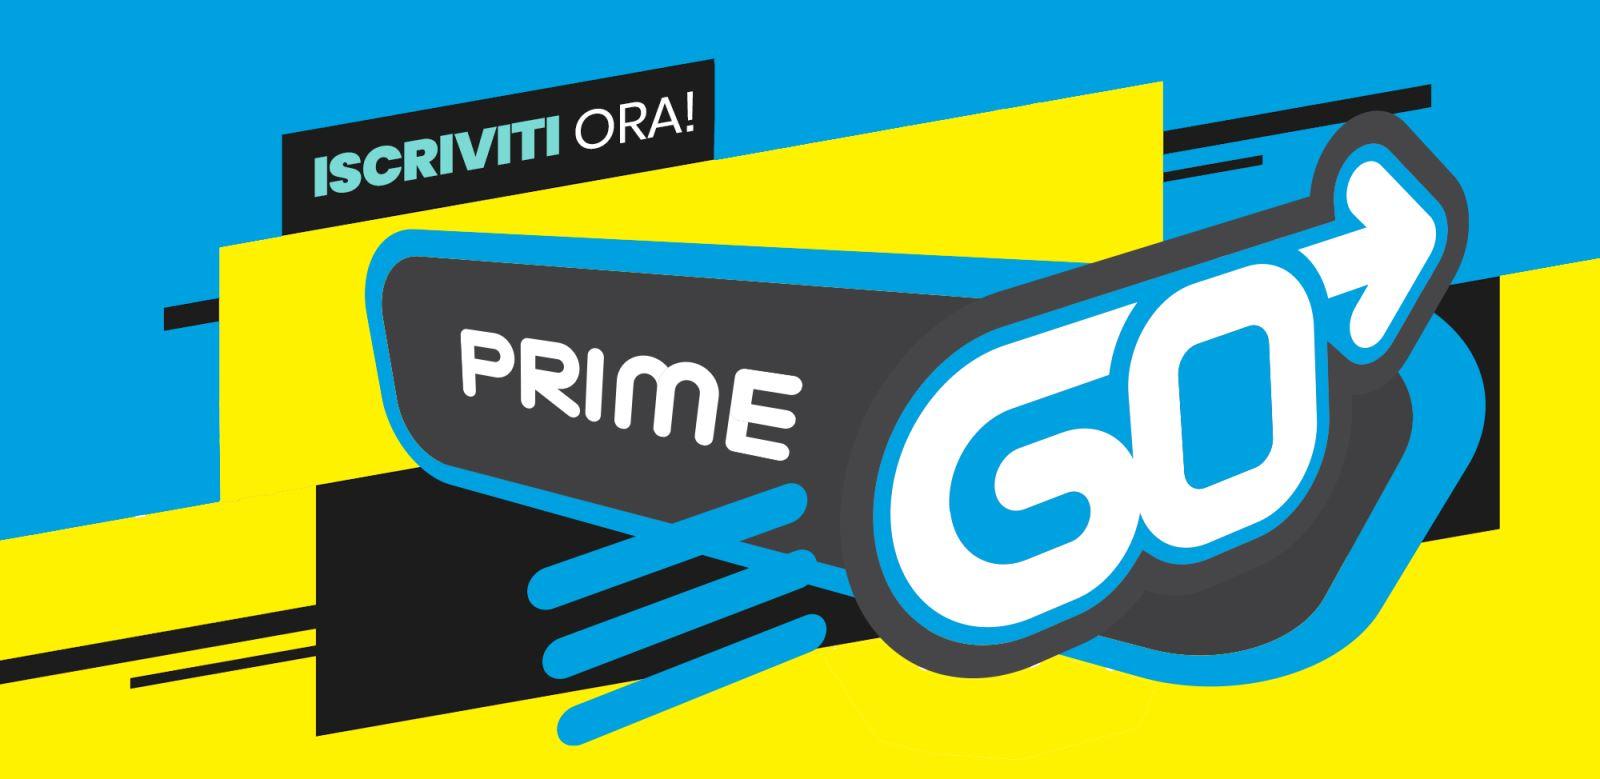 PrimeGO